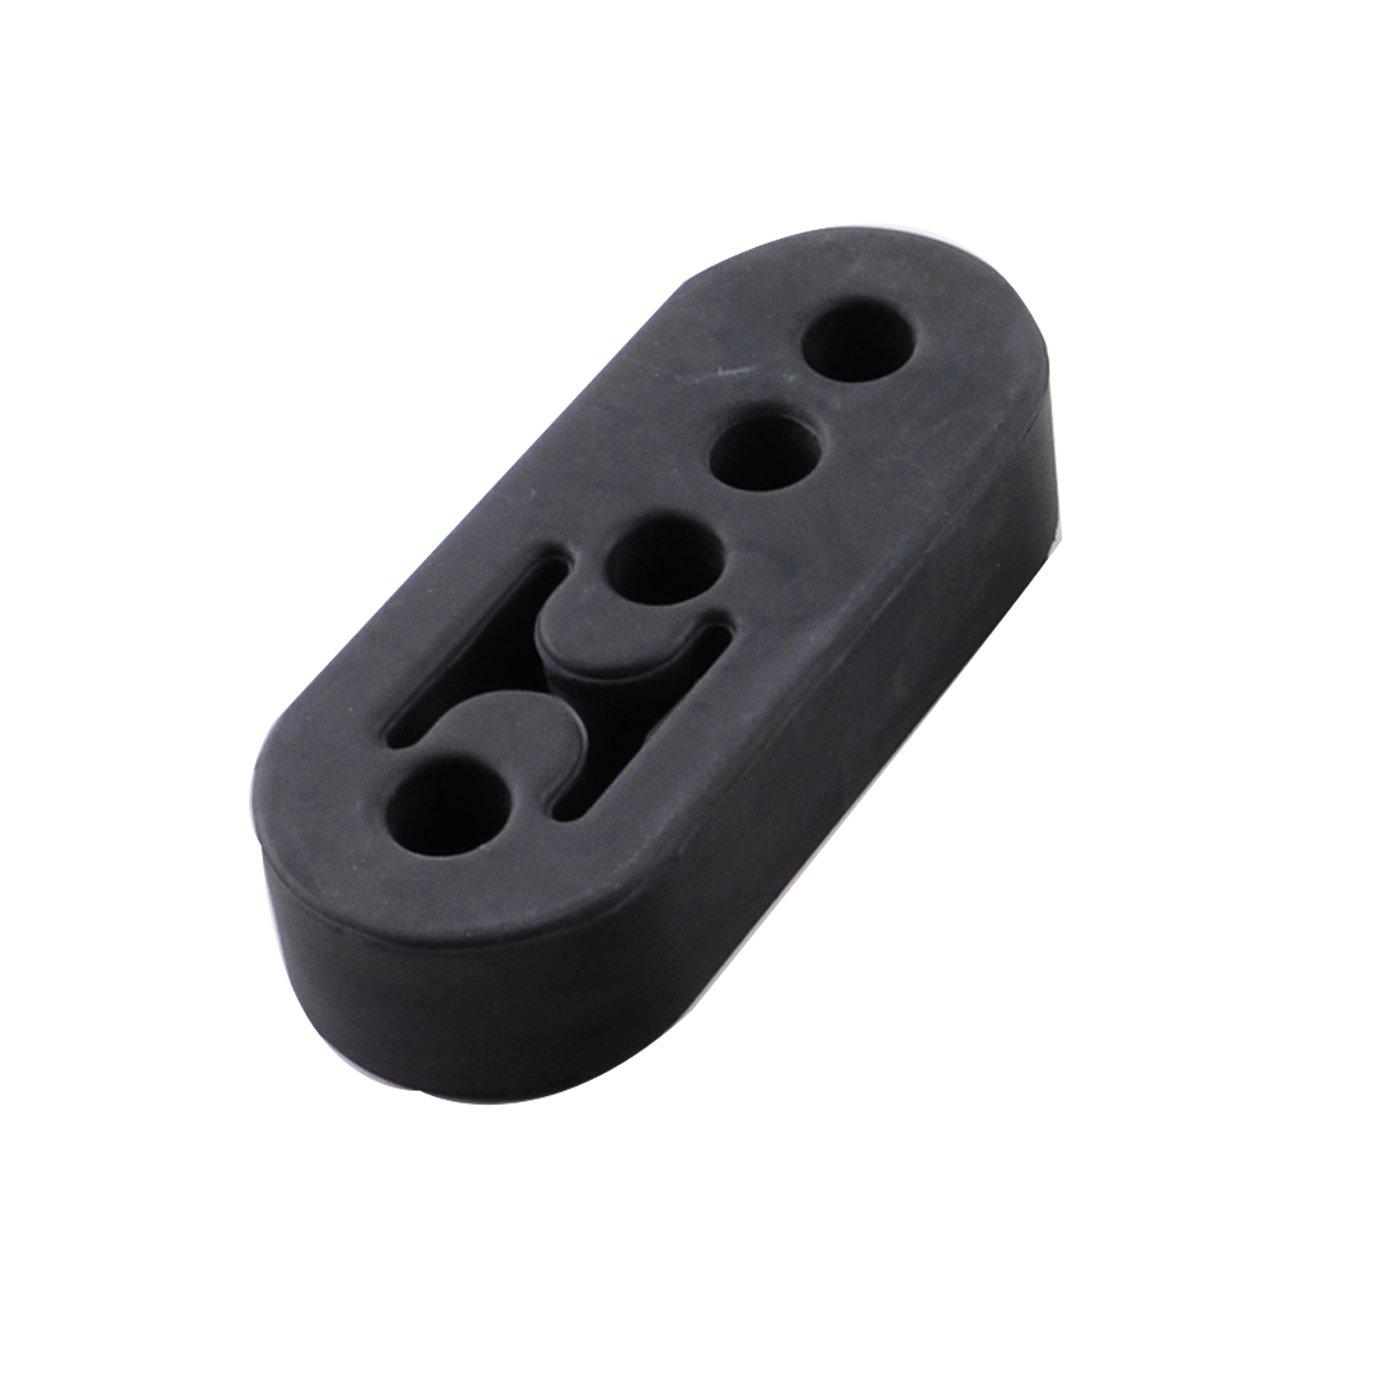 0.63 Black for 6AN Fuel Hose Aluminum Hex Hose Finisher Clamp Hose OD 16mm